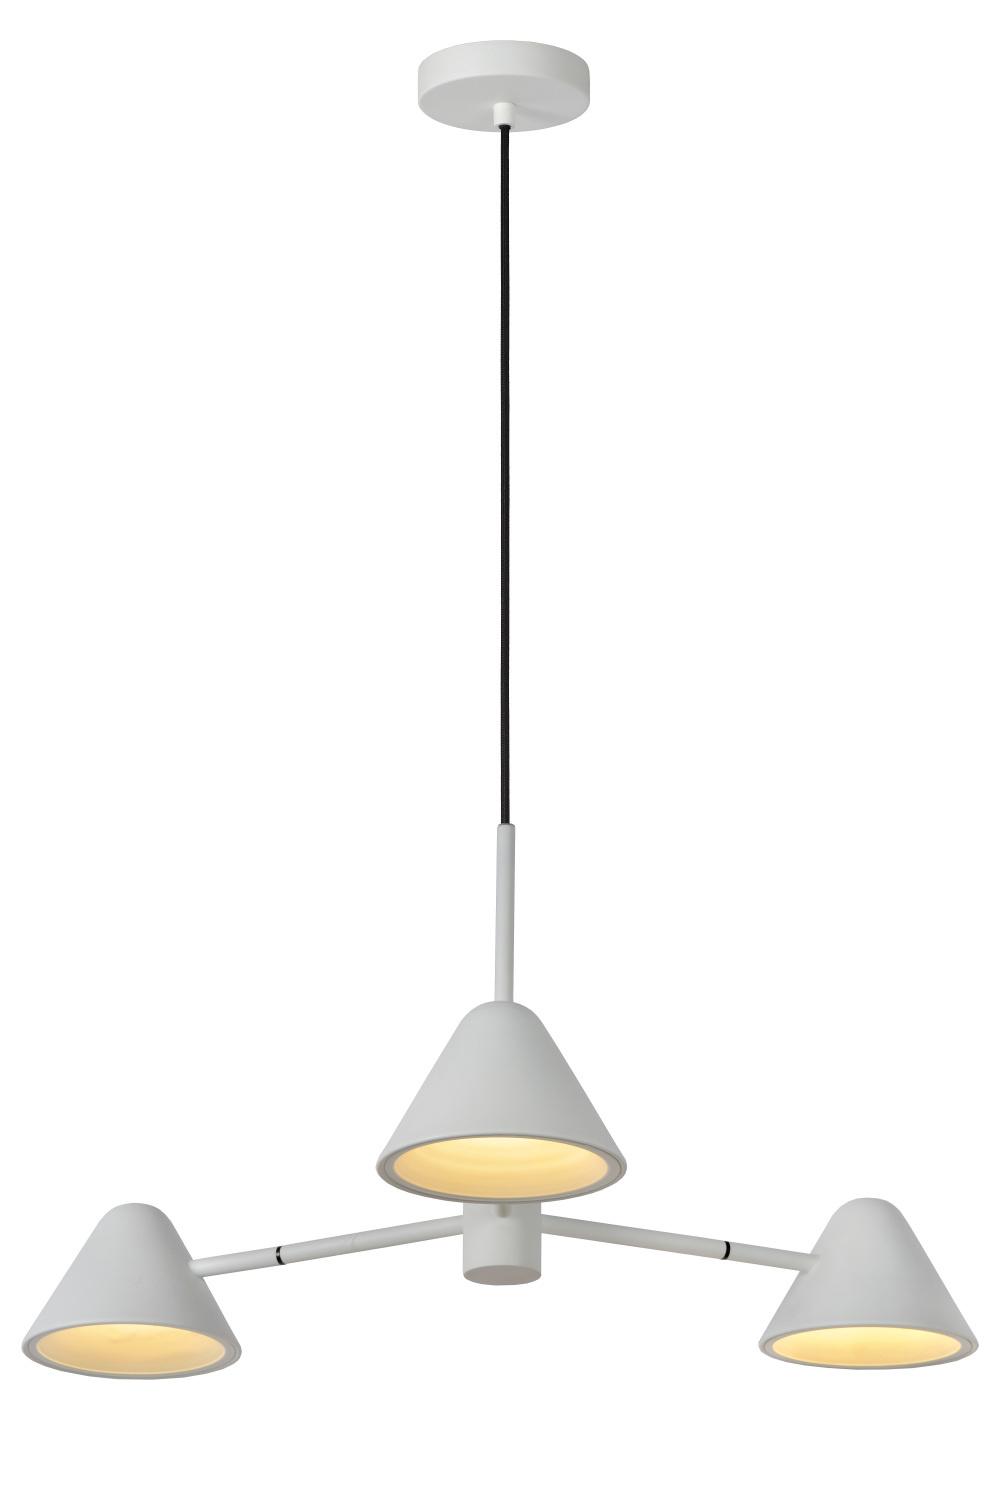 Lucide Devon Hanglamp 3x3w Led Wit